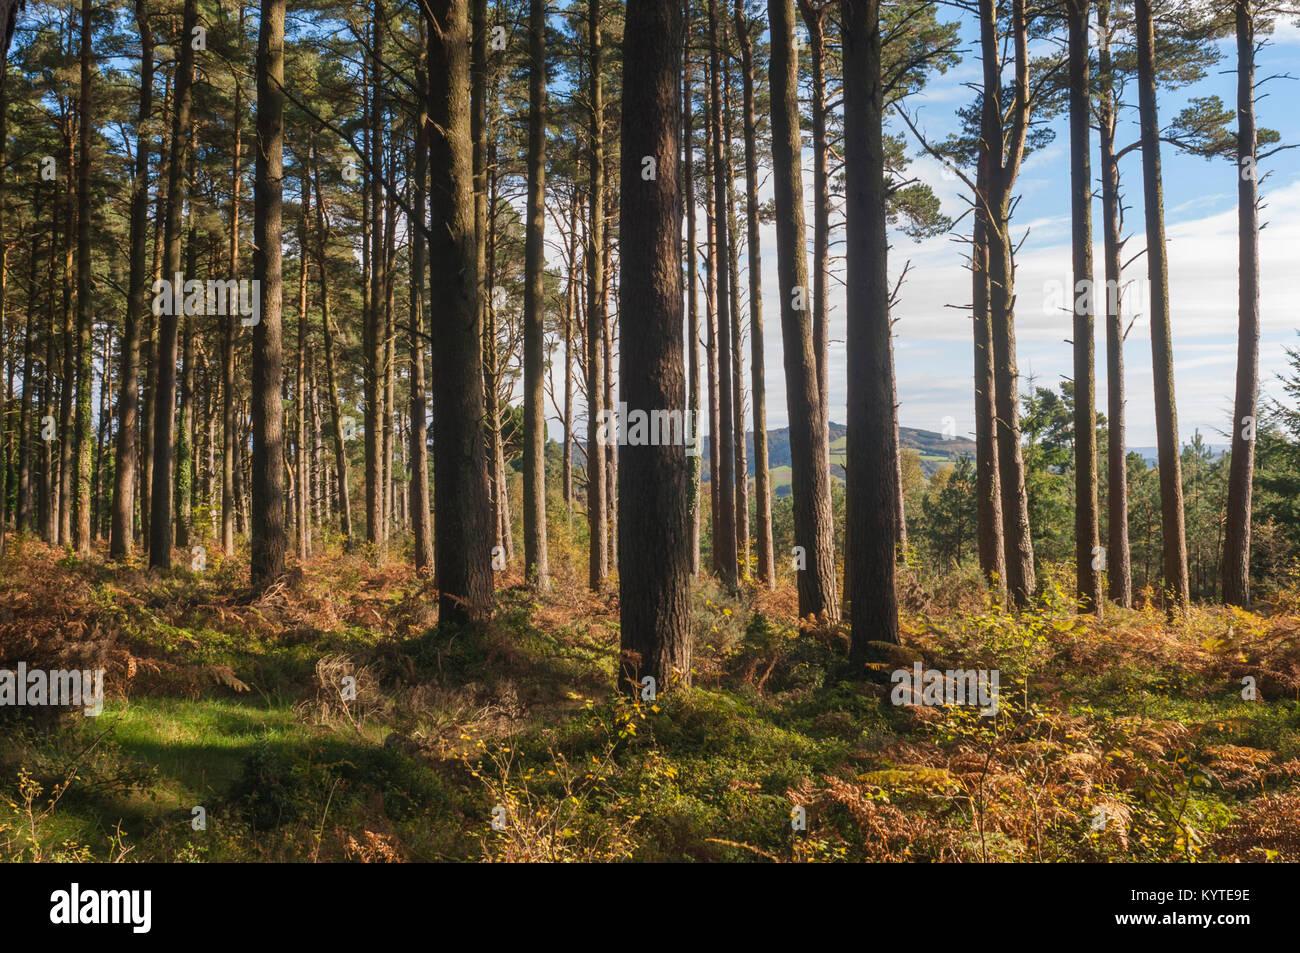 Autumn sunlight in pine forest, Exmoor, Somerset, UK - John Gollop - Stock Image